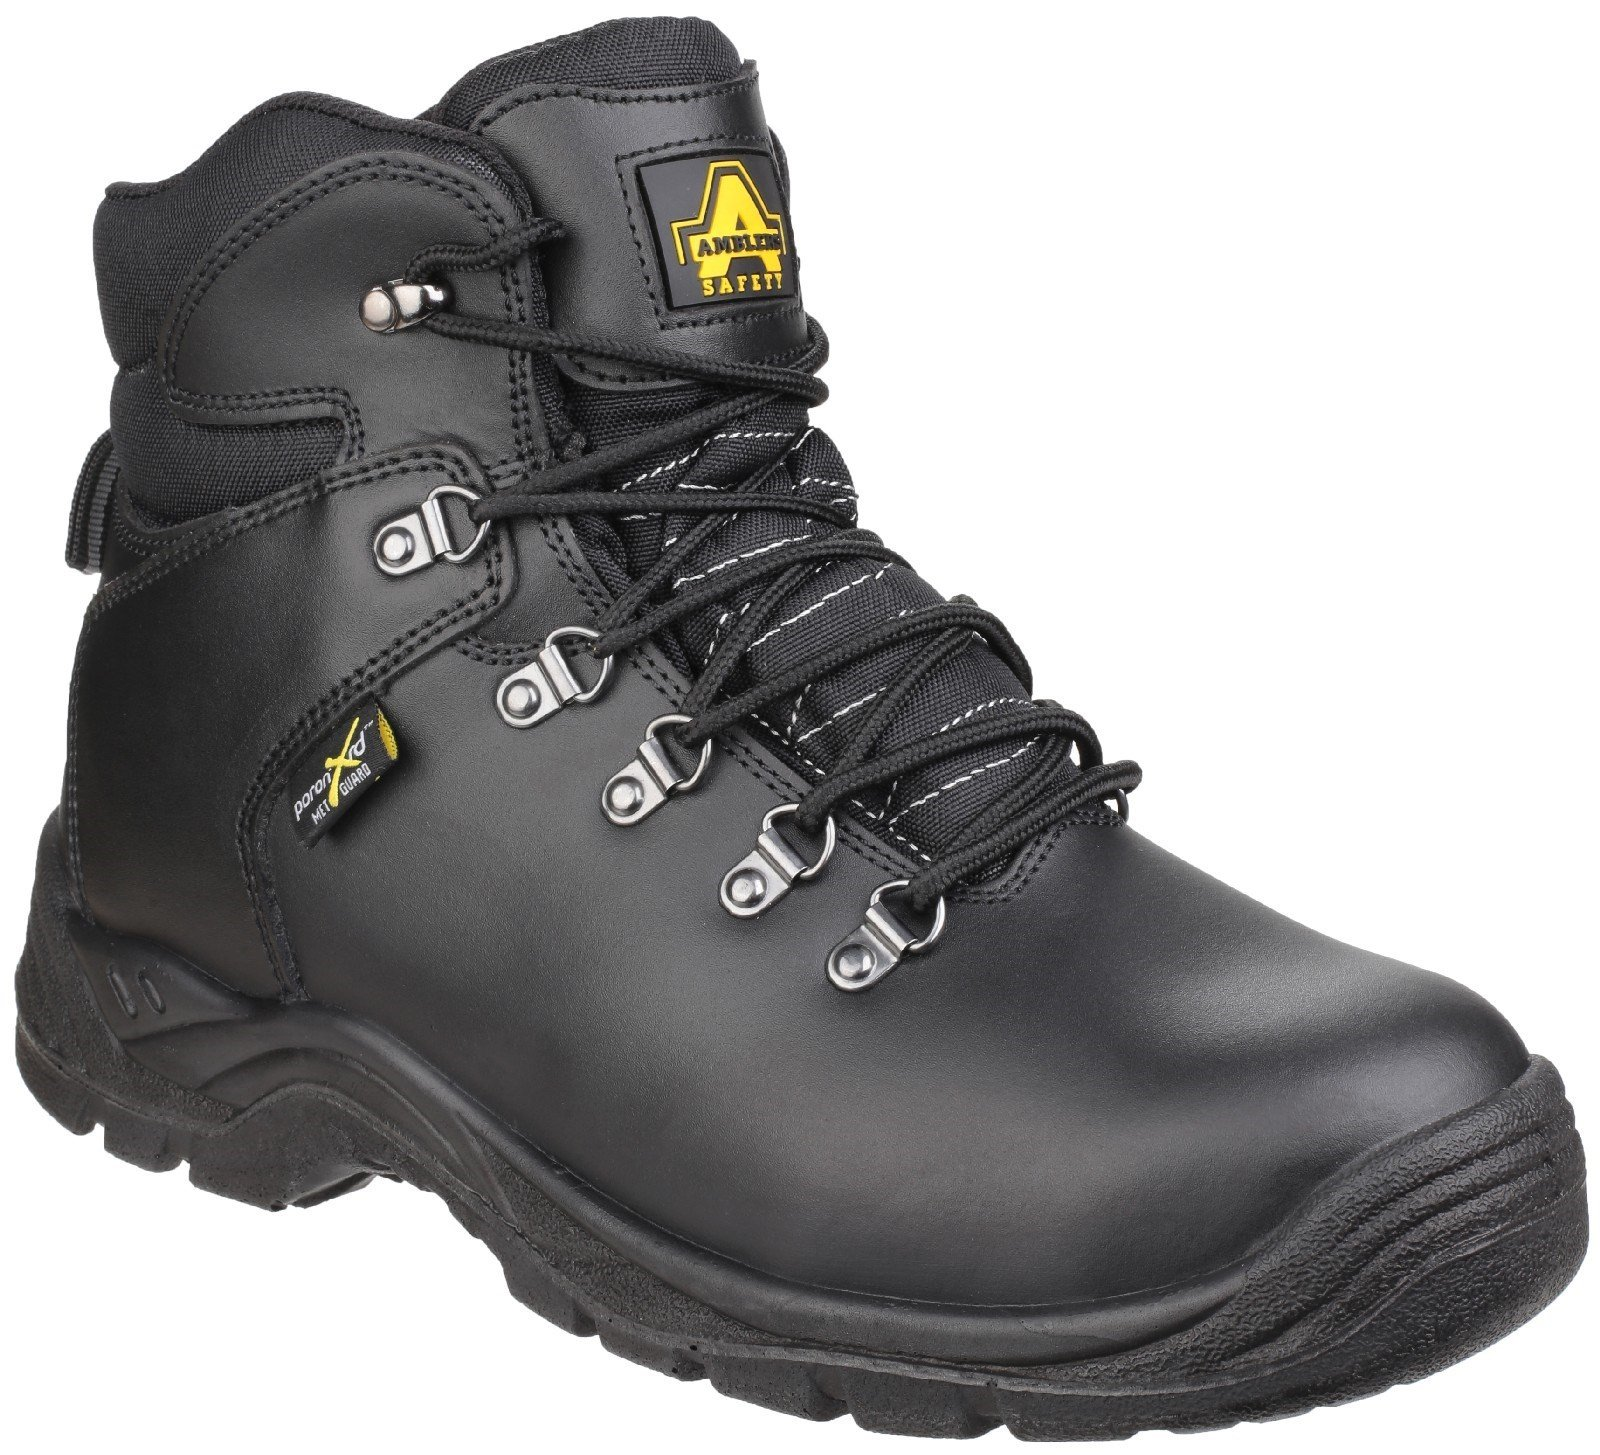 Amblers Unisex Safety Poron XRD Internal Metatarsal Safety Boot Black 26171 - Black 3